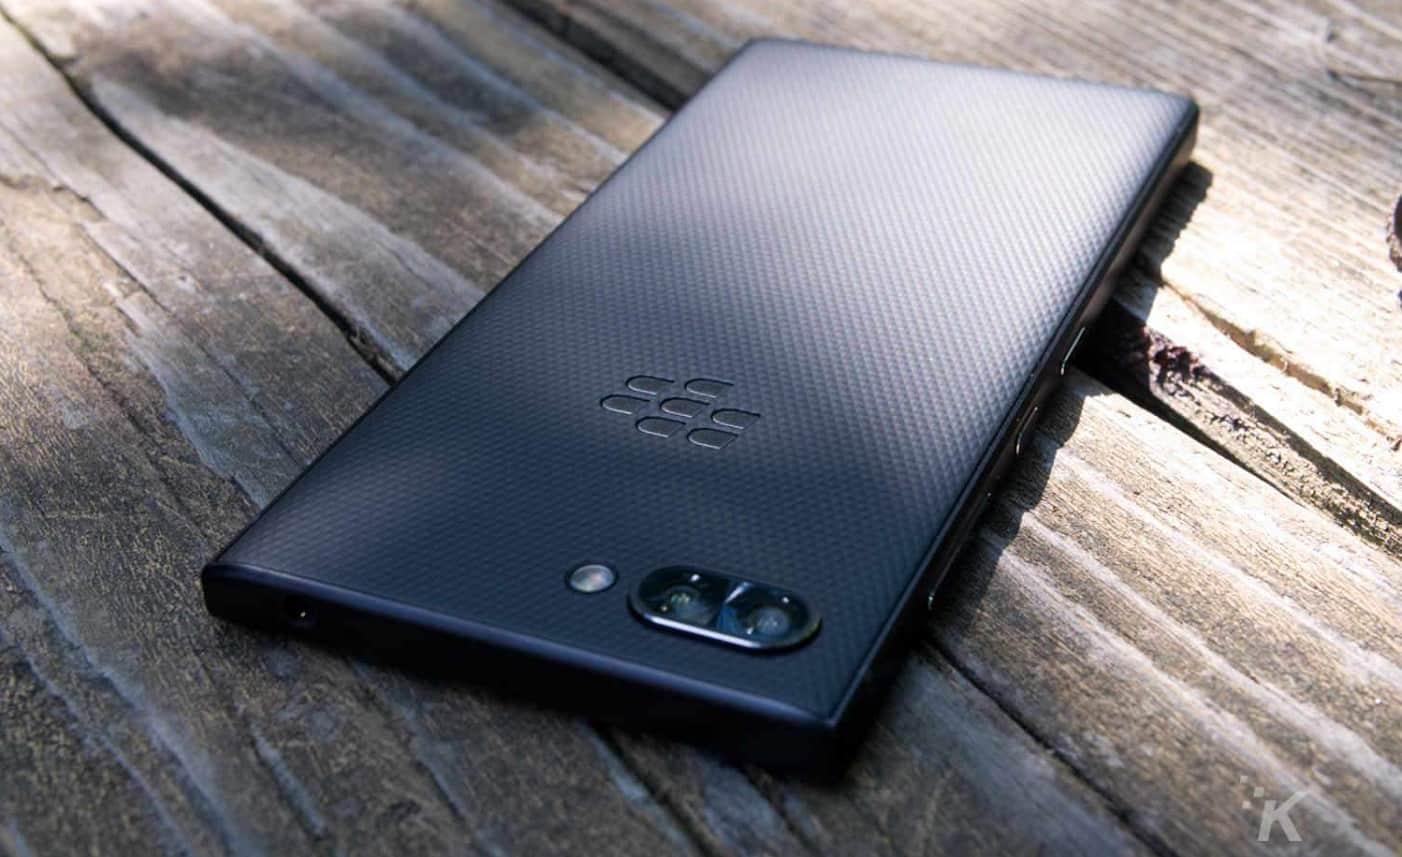 blackberry key2 smartphone on wooden table